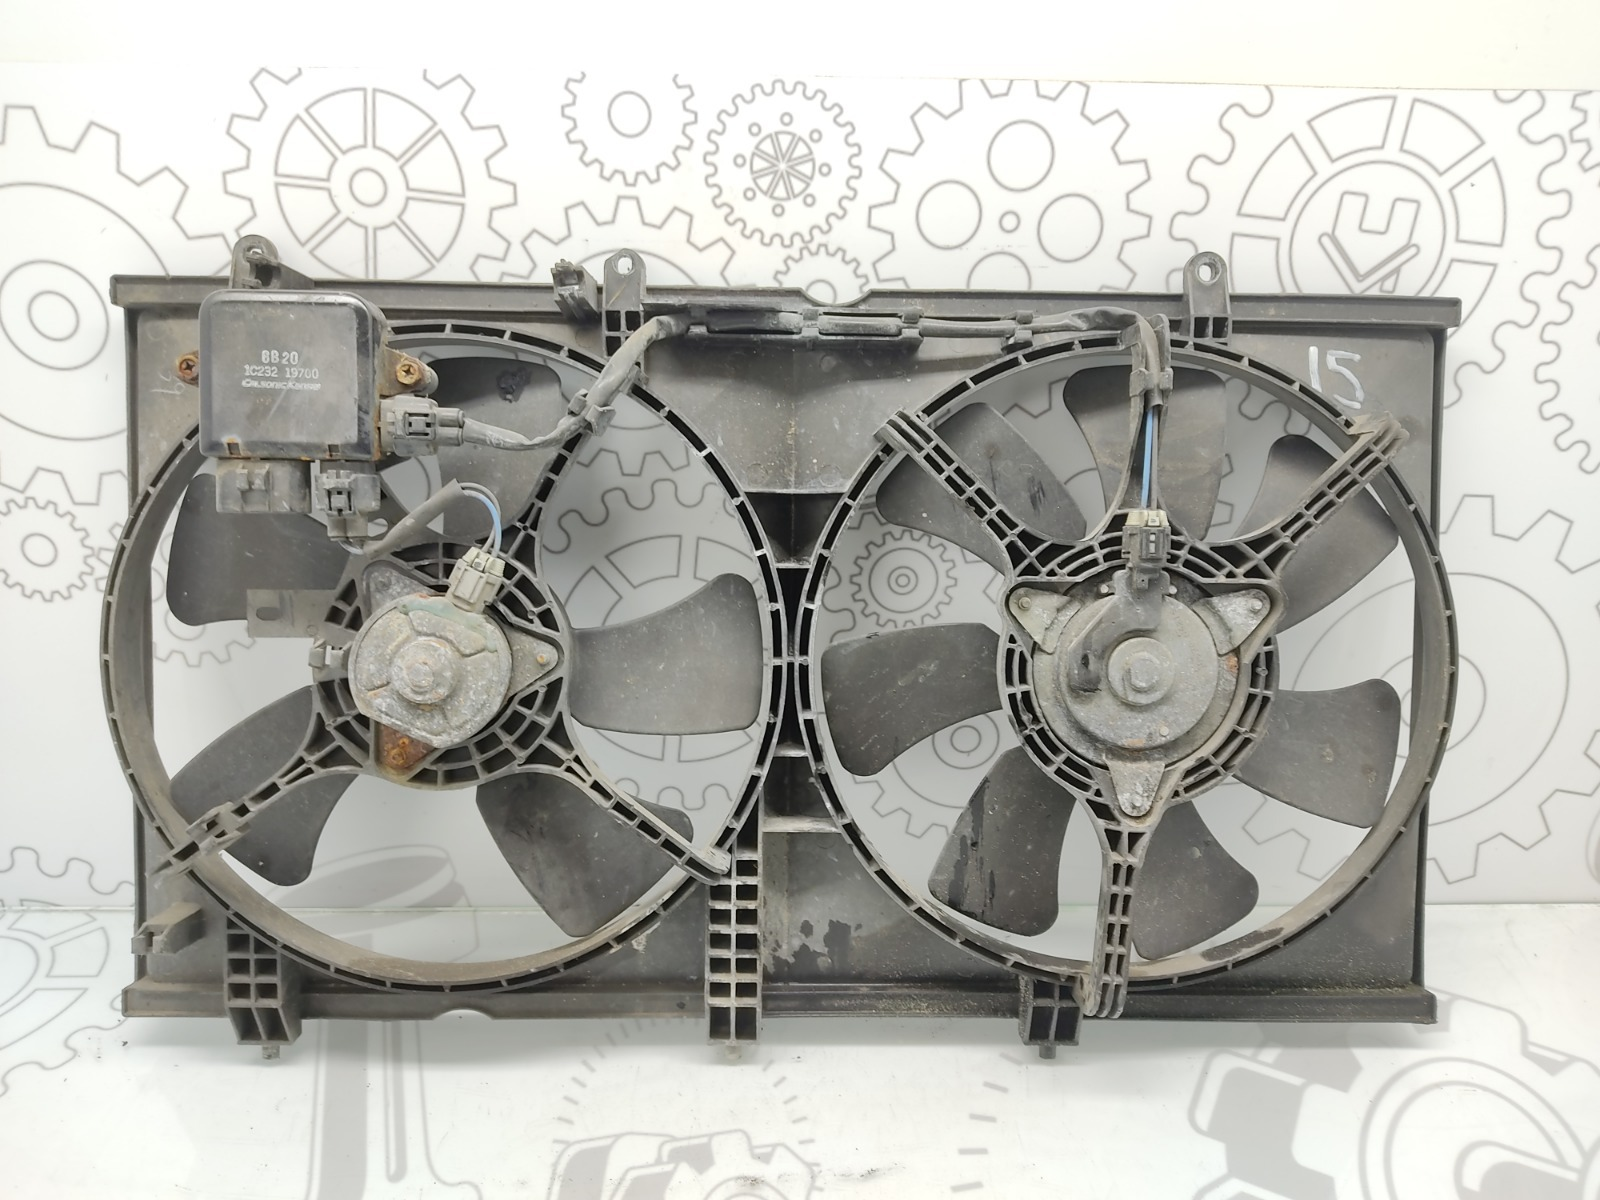 Вентилятор радиатора Mitsubishi Lancer 1.6 I 2006 (б/у)